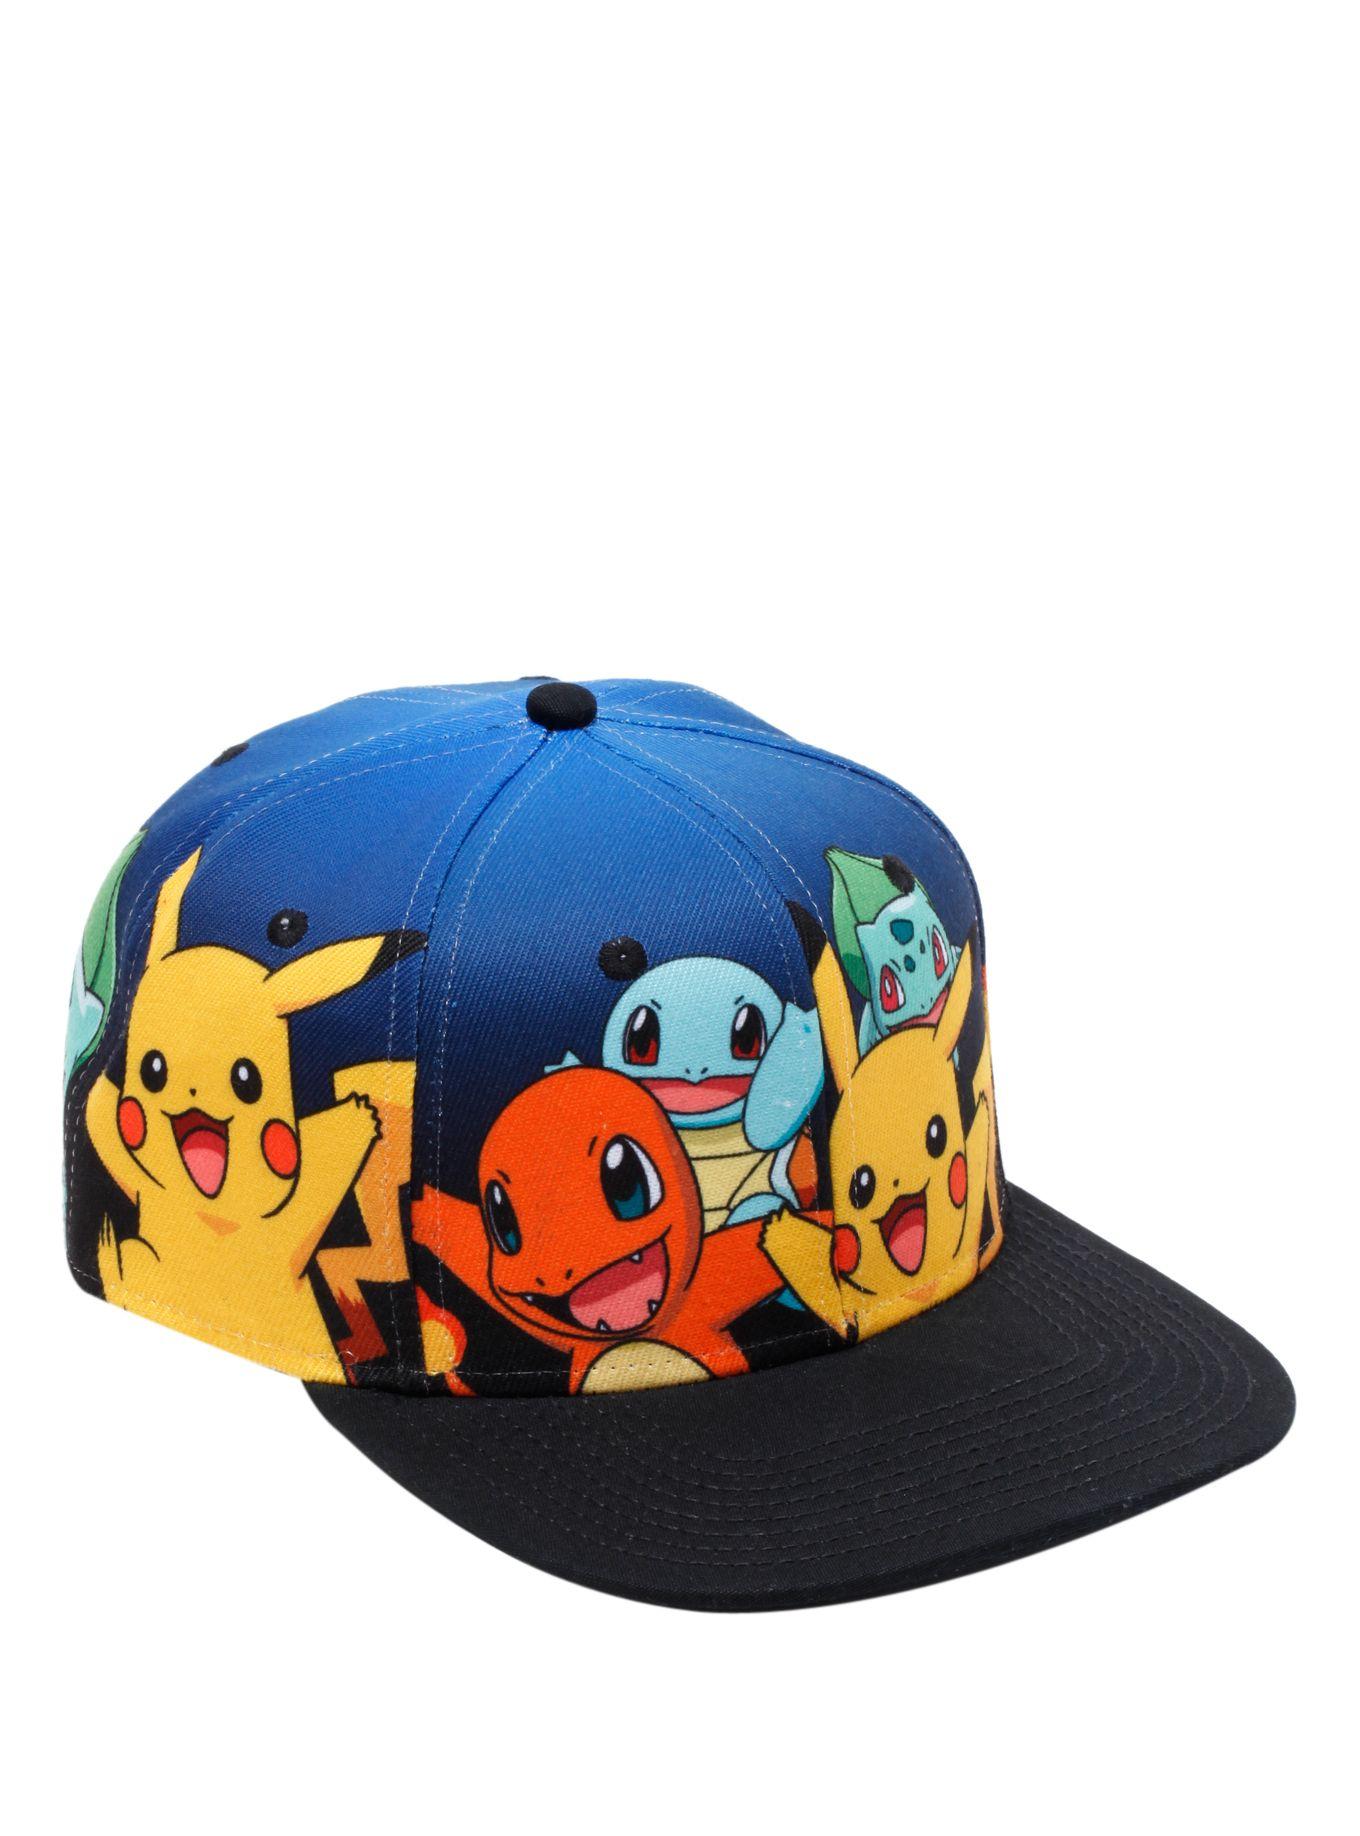 dae50d0e0 Pokemon Starters Snapback Hat | Gift Ideas For AJ | Snapback hats ...